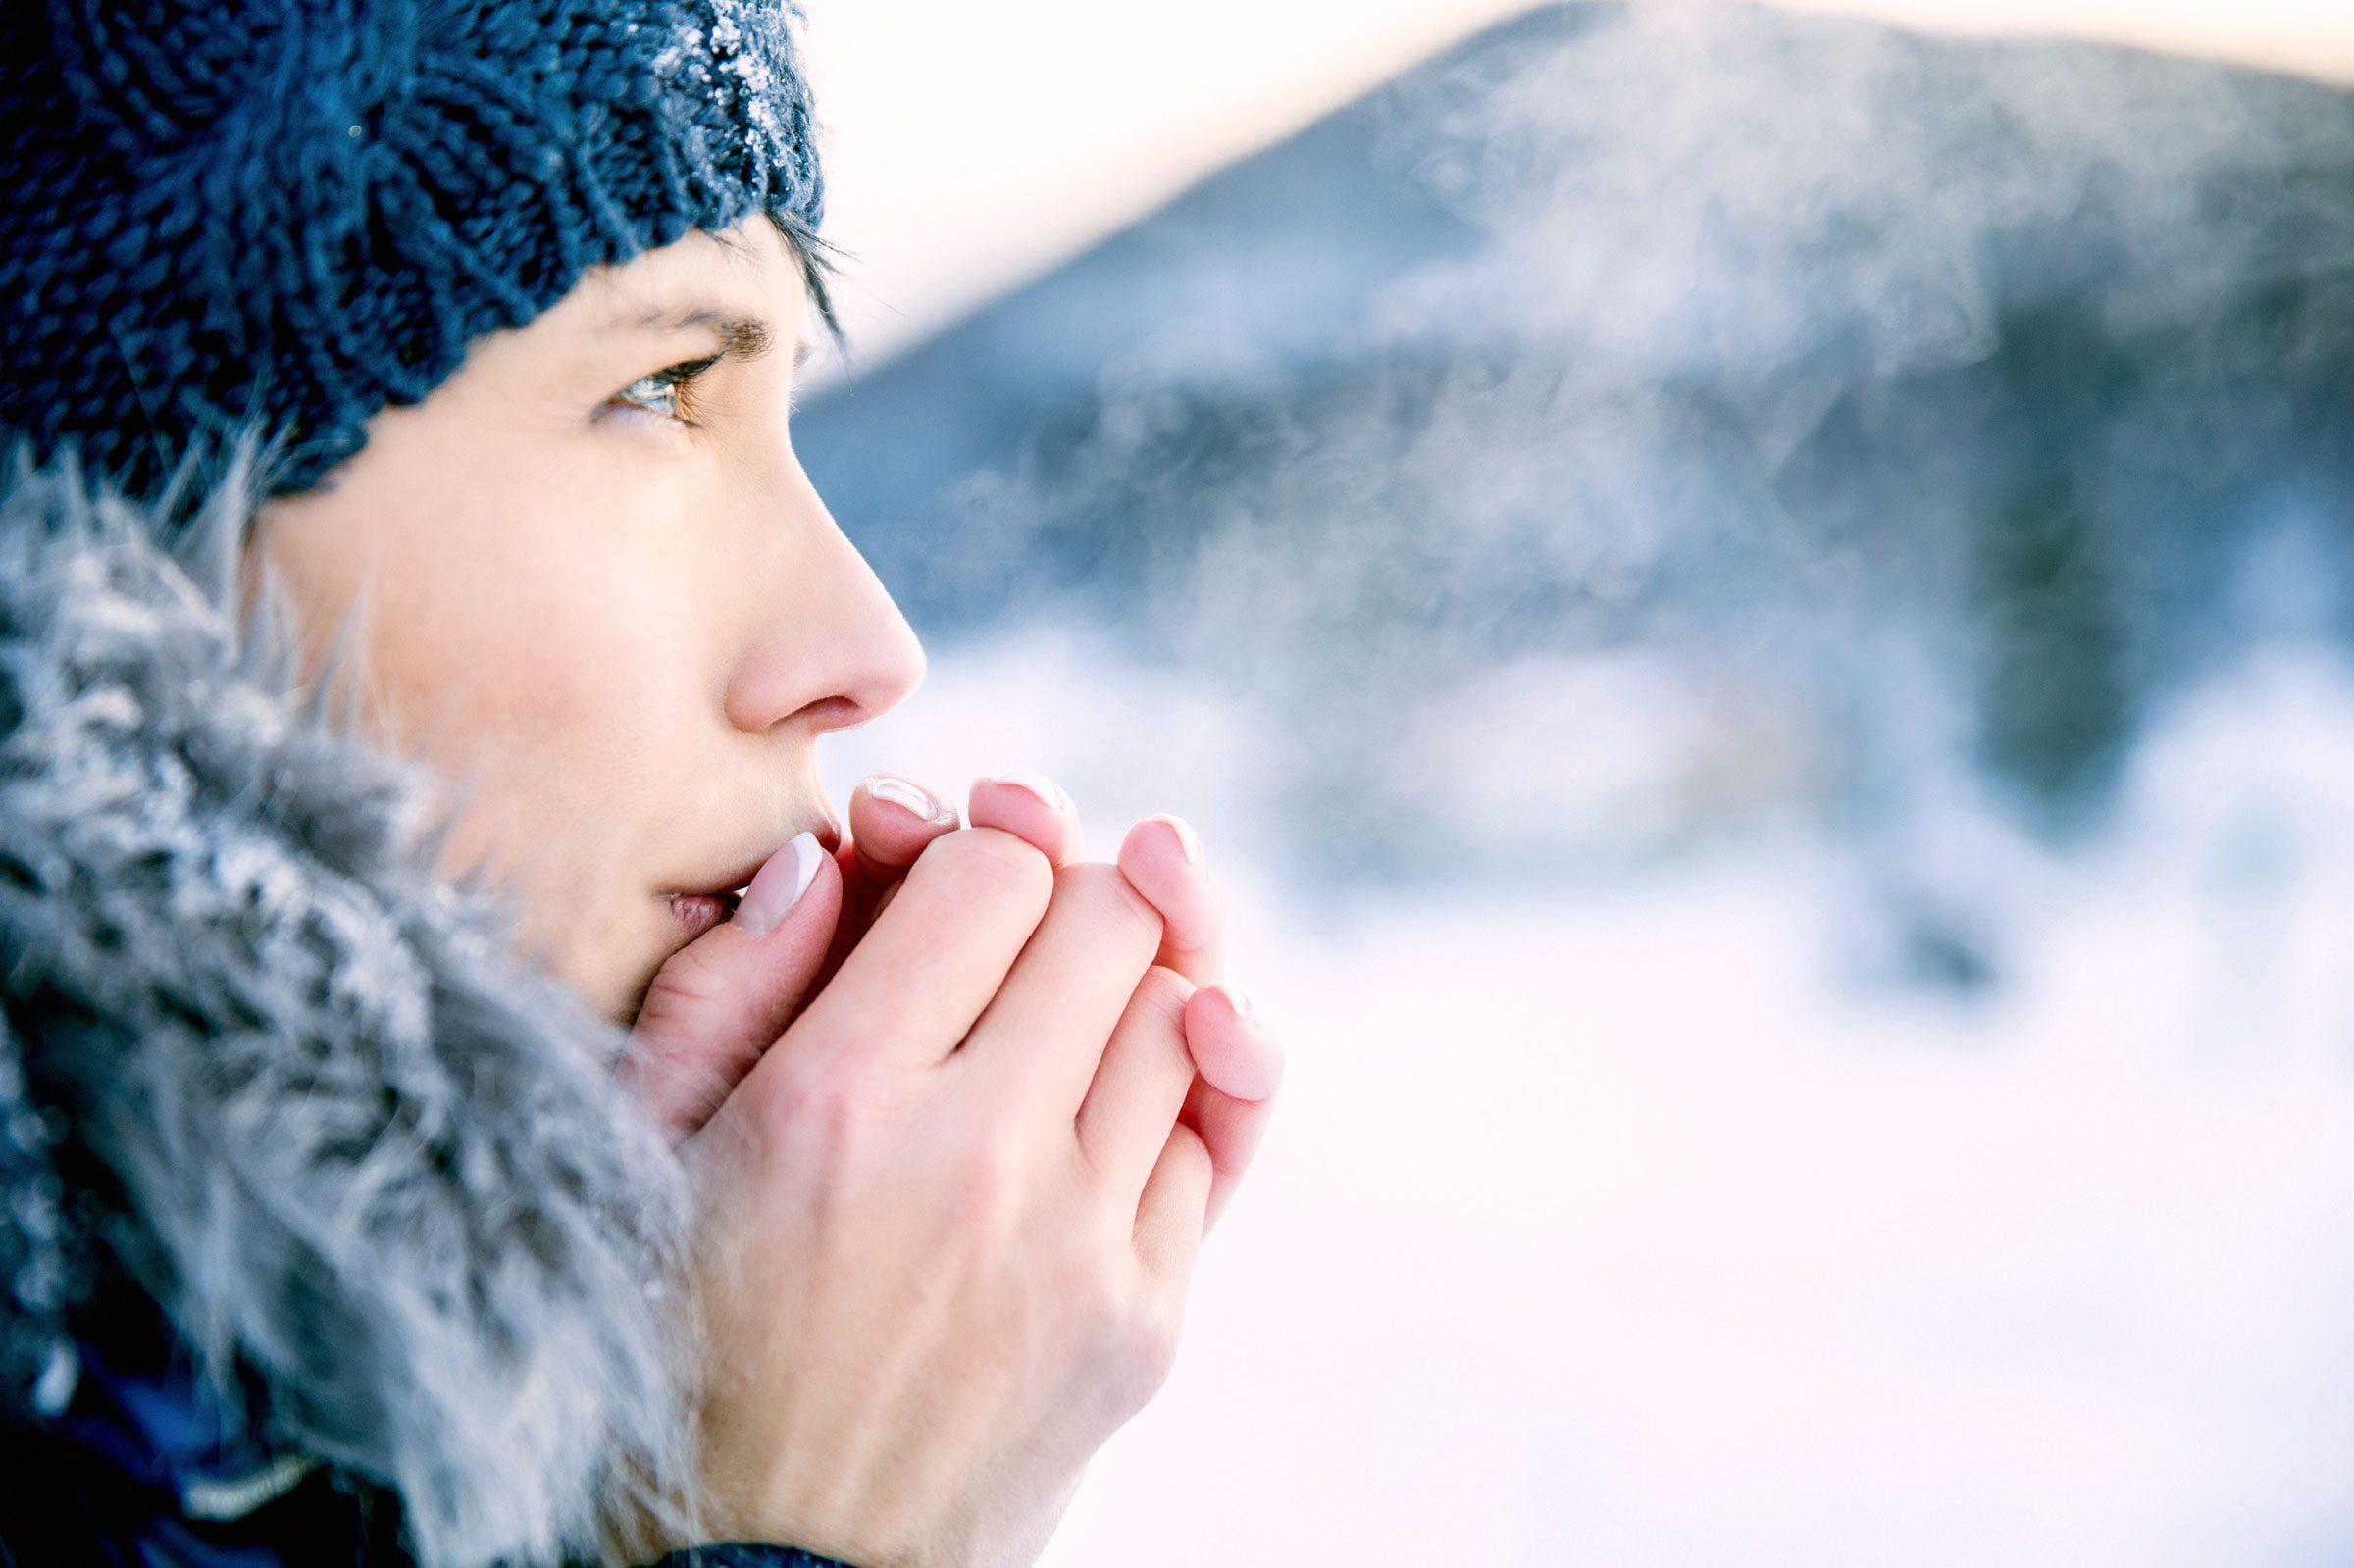 How come women always seem colder than men?